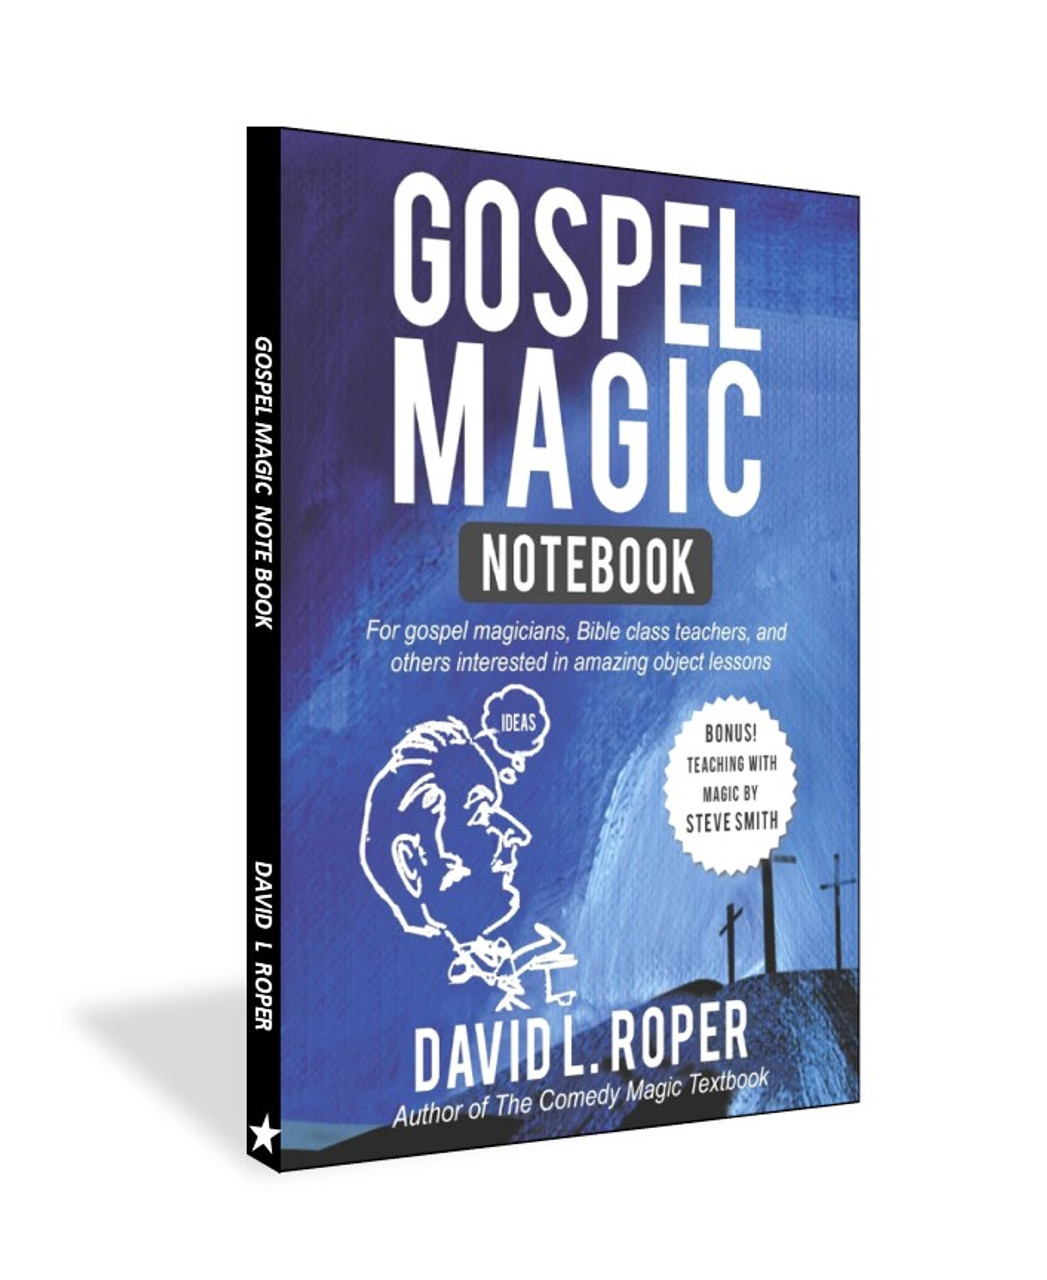 David L Roper Gospel Magic Note Book Object Lessons Tricks Children